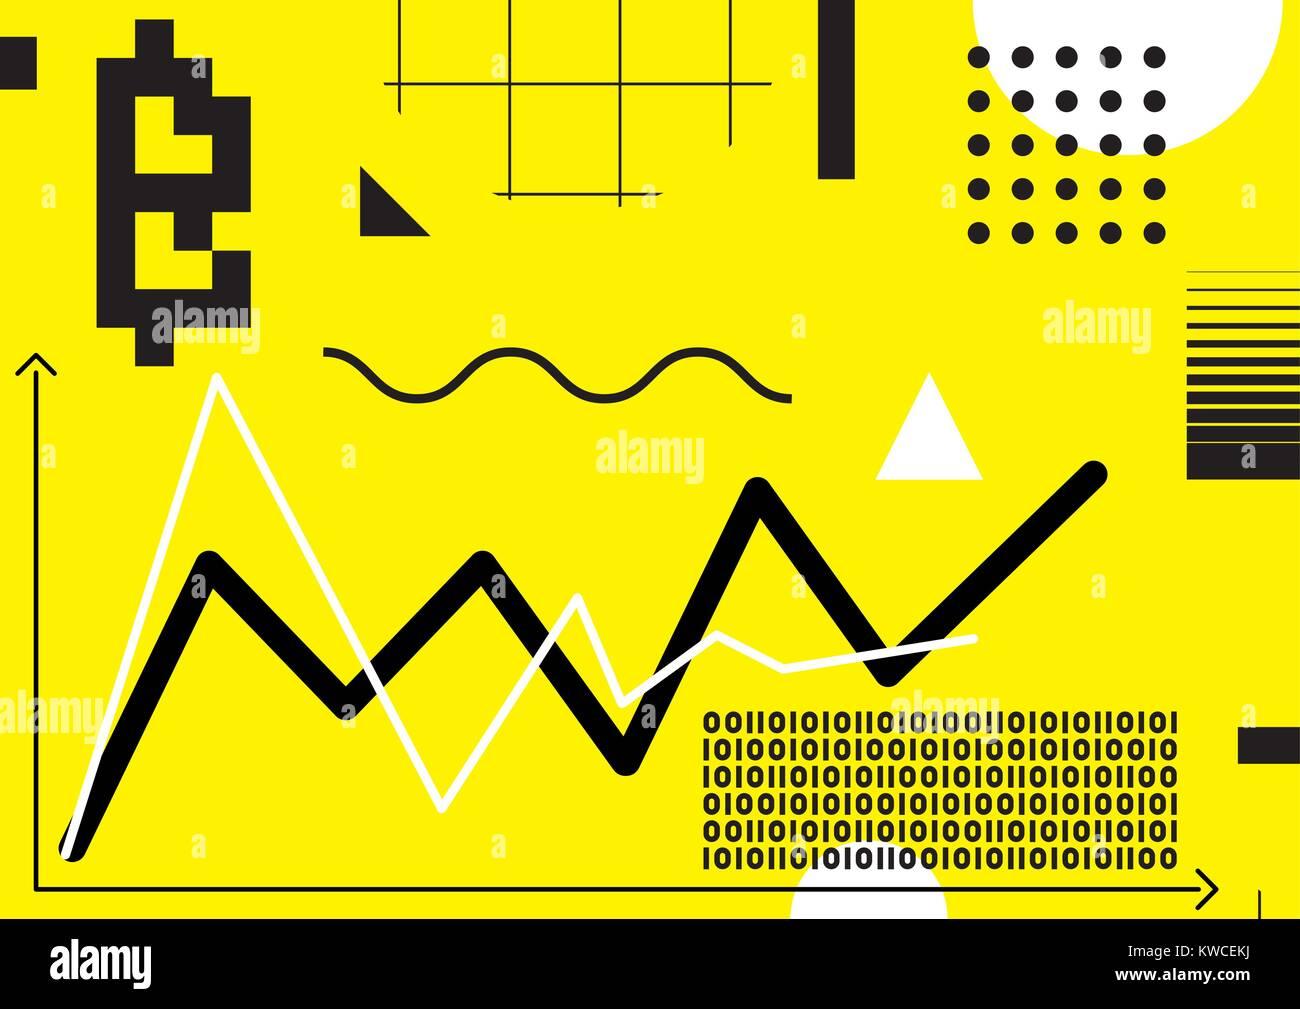 Typography horizontal banner for Blockchain - Stock Image